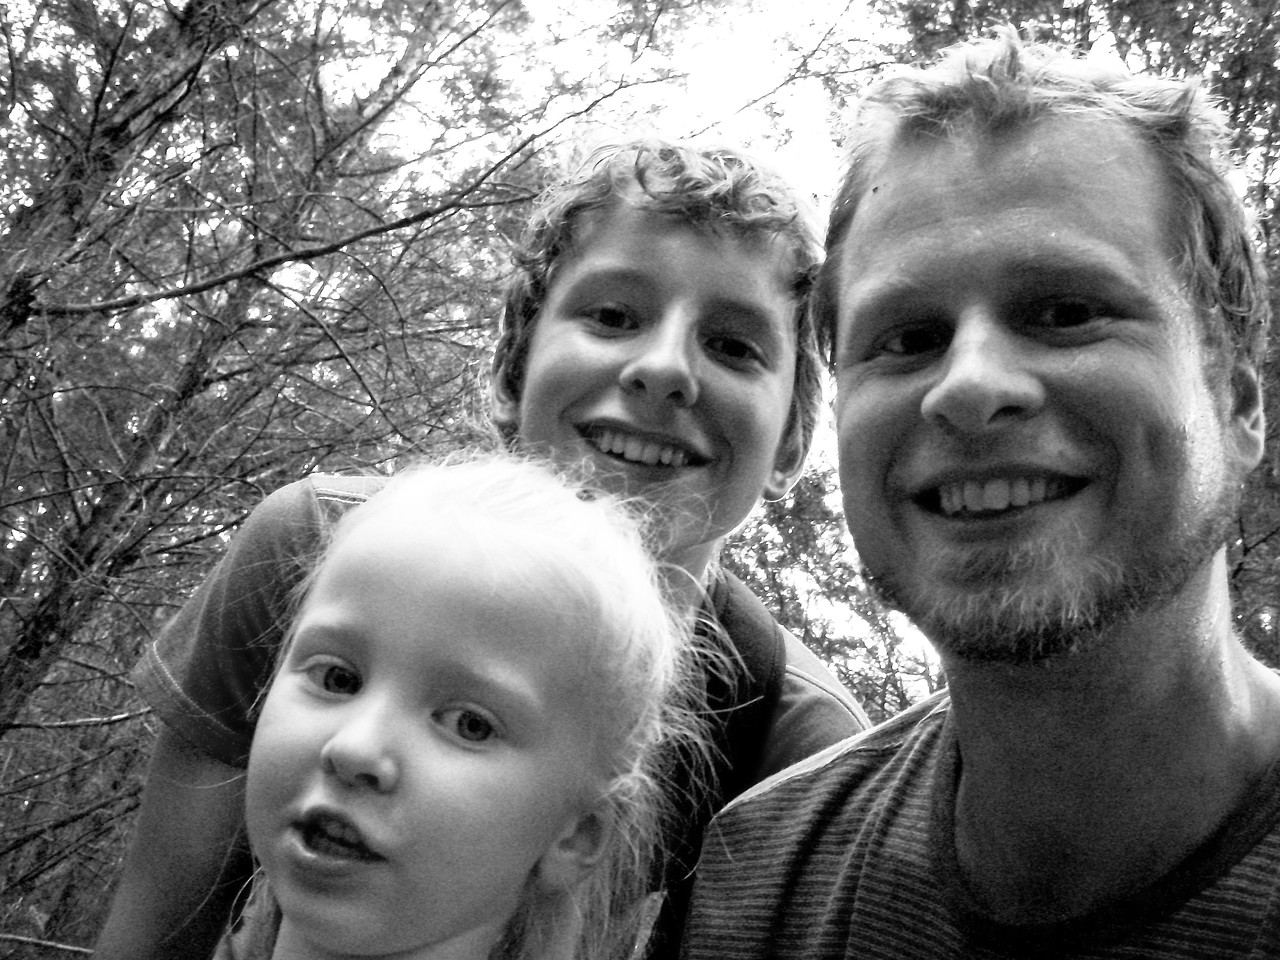 Chloe, Josh, and Tim Howland - July 2010